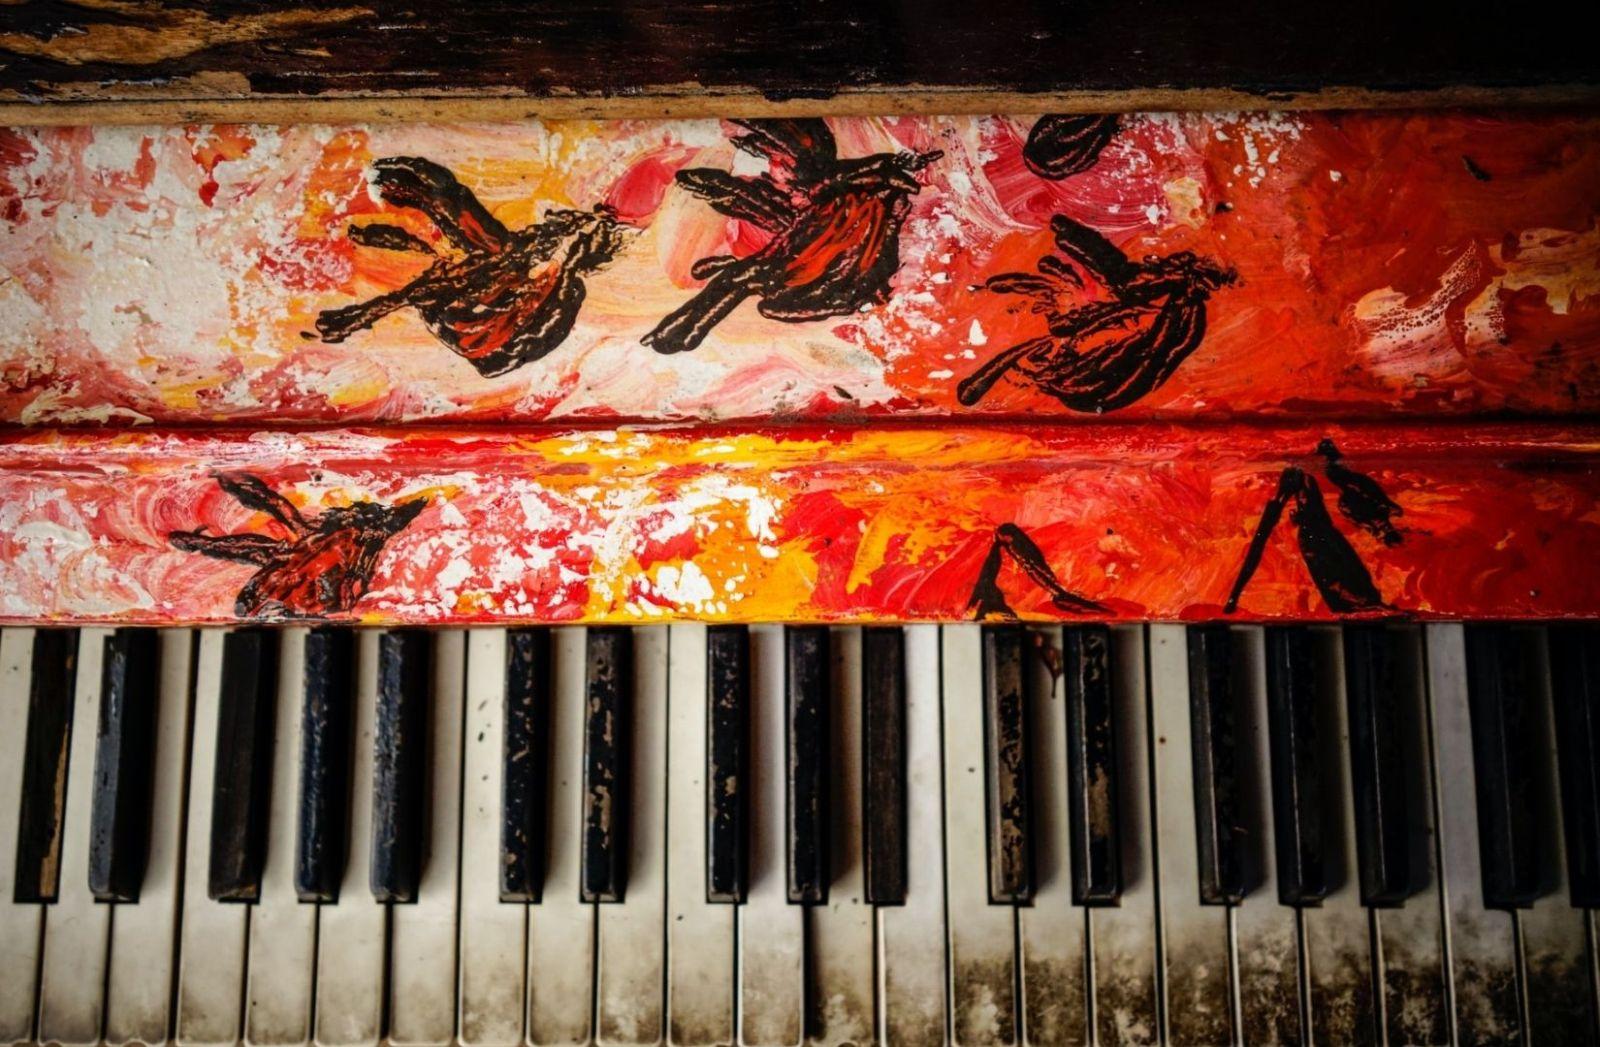 Verschmutztes Klavier mit Bemalung. (Foto: Patrick Hendry, Unsplash.com)